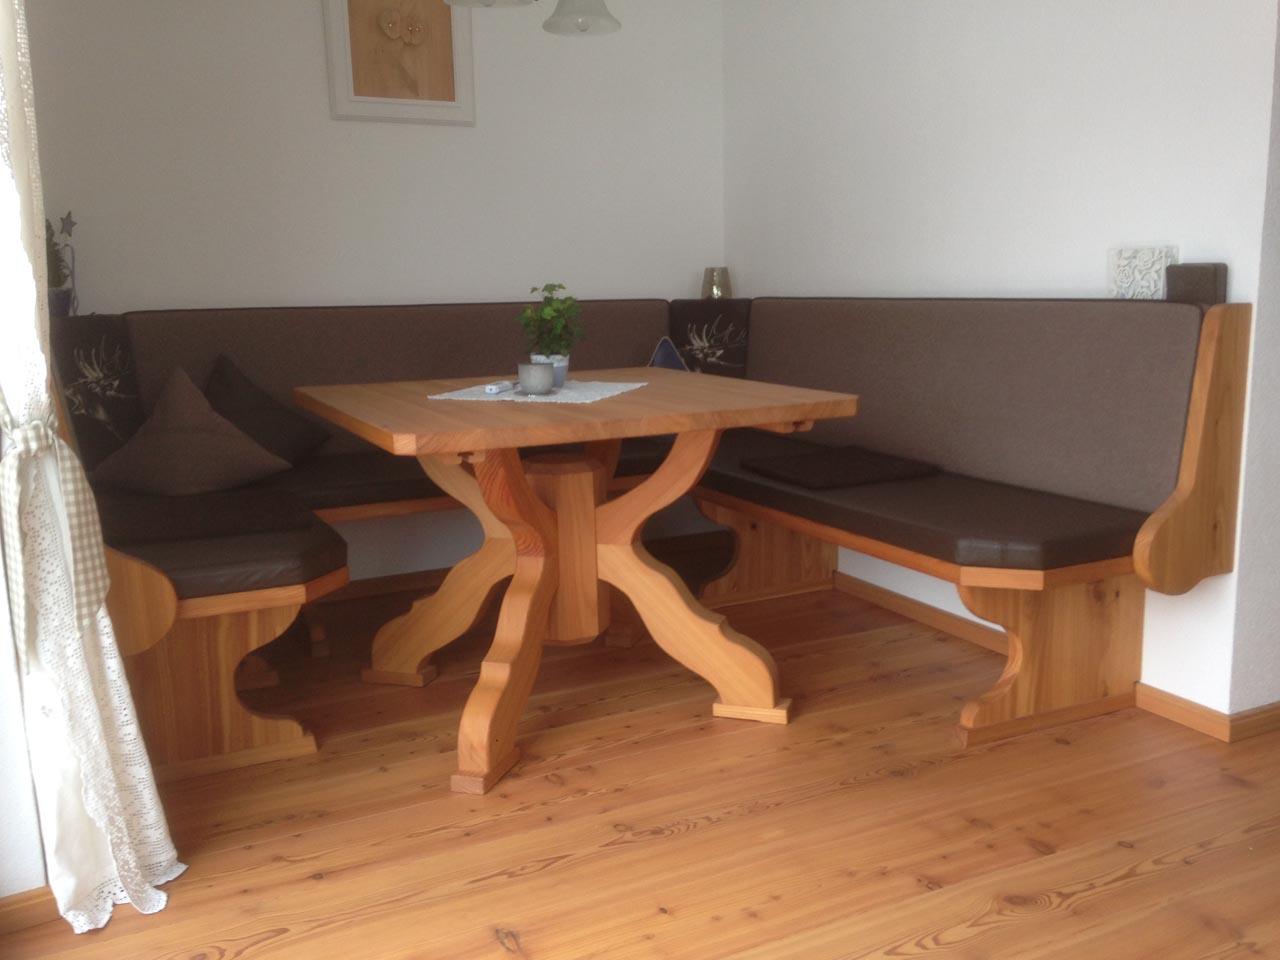 eckbank tisch lifestyle tischlerei thomas w tzer tannheim tirol lifestyle tischlerei. Black Bedroom Furniture Sets. Home Design Ideas